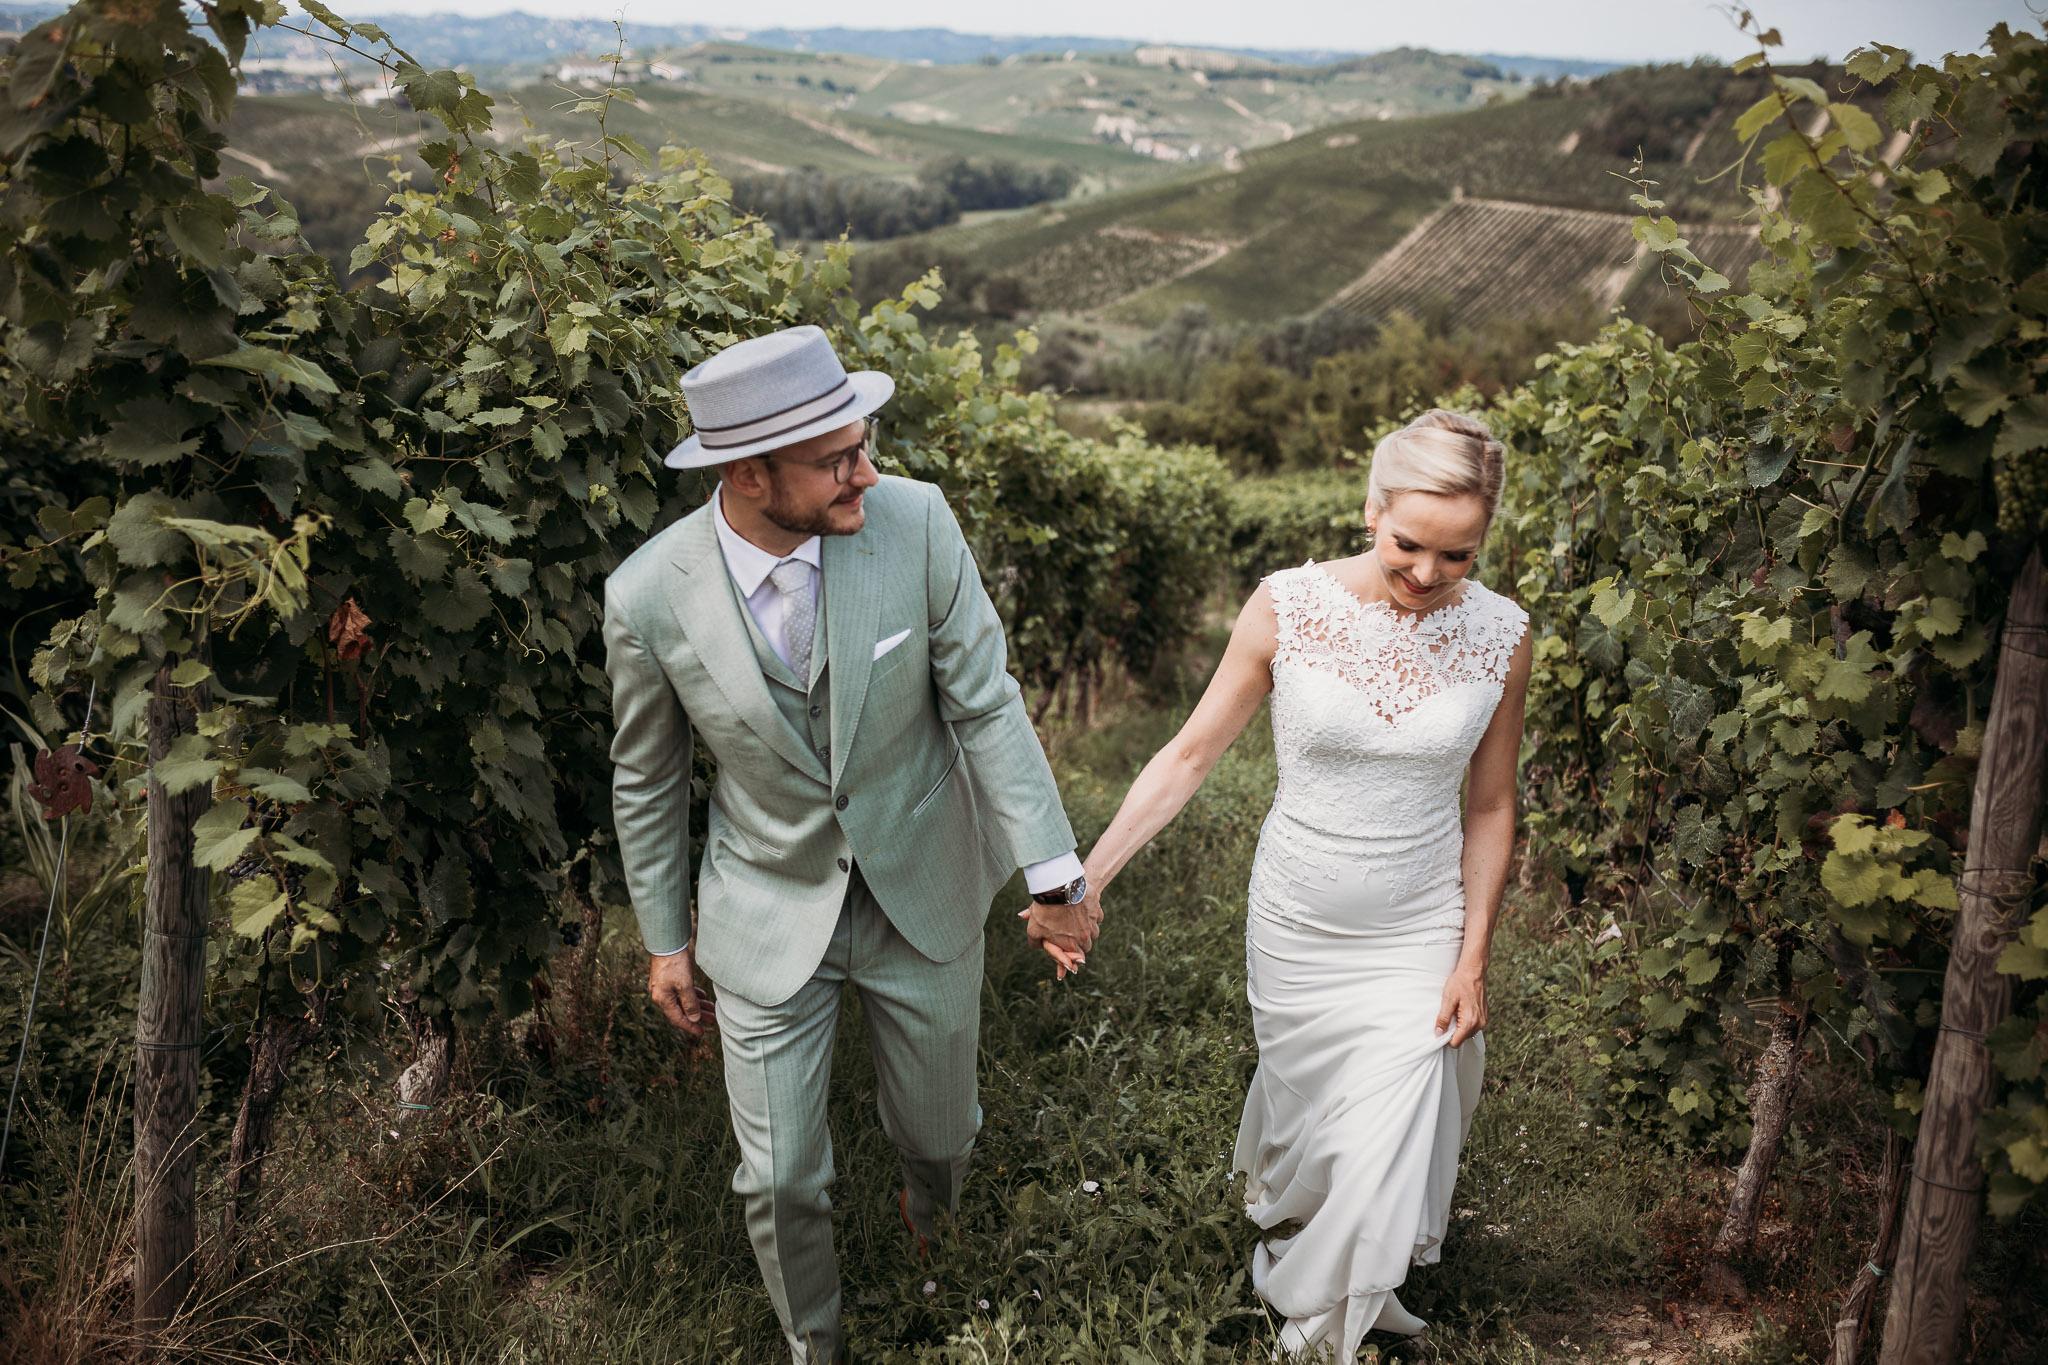 Photo shoot in the vineyards of Piedmont